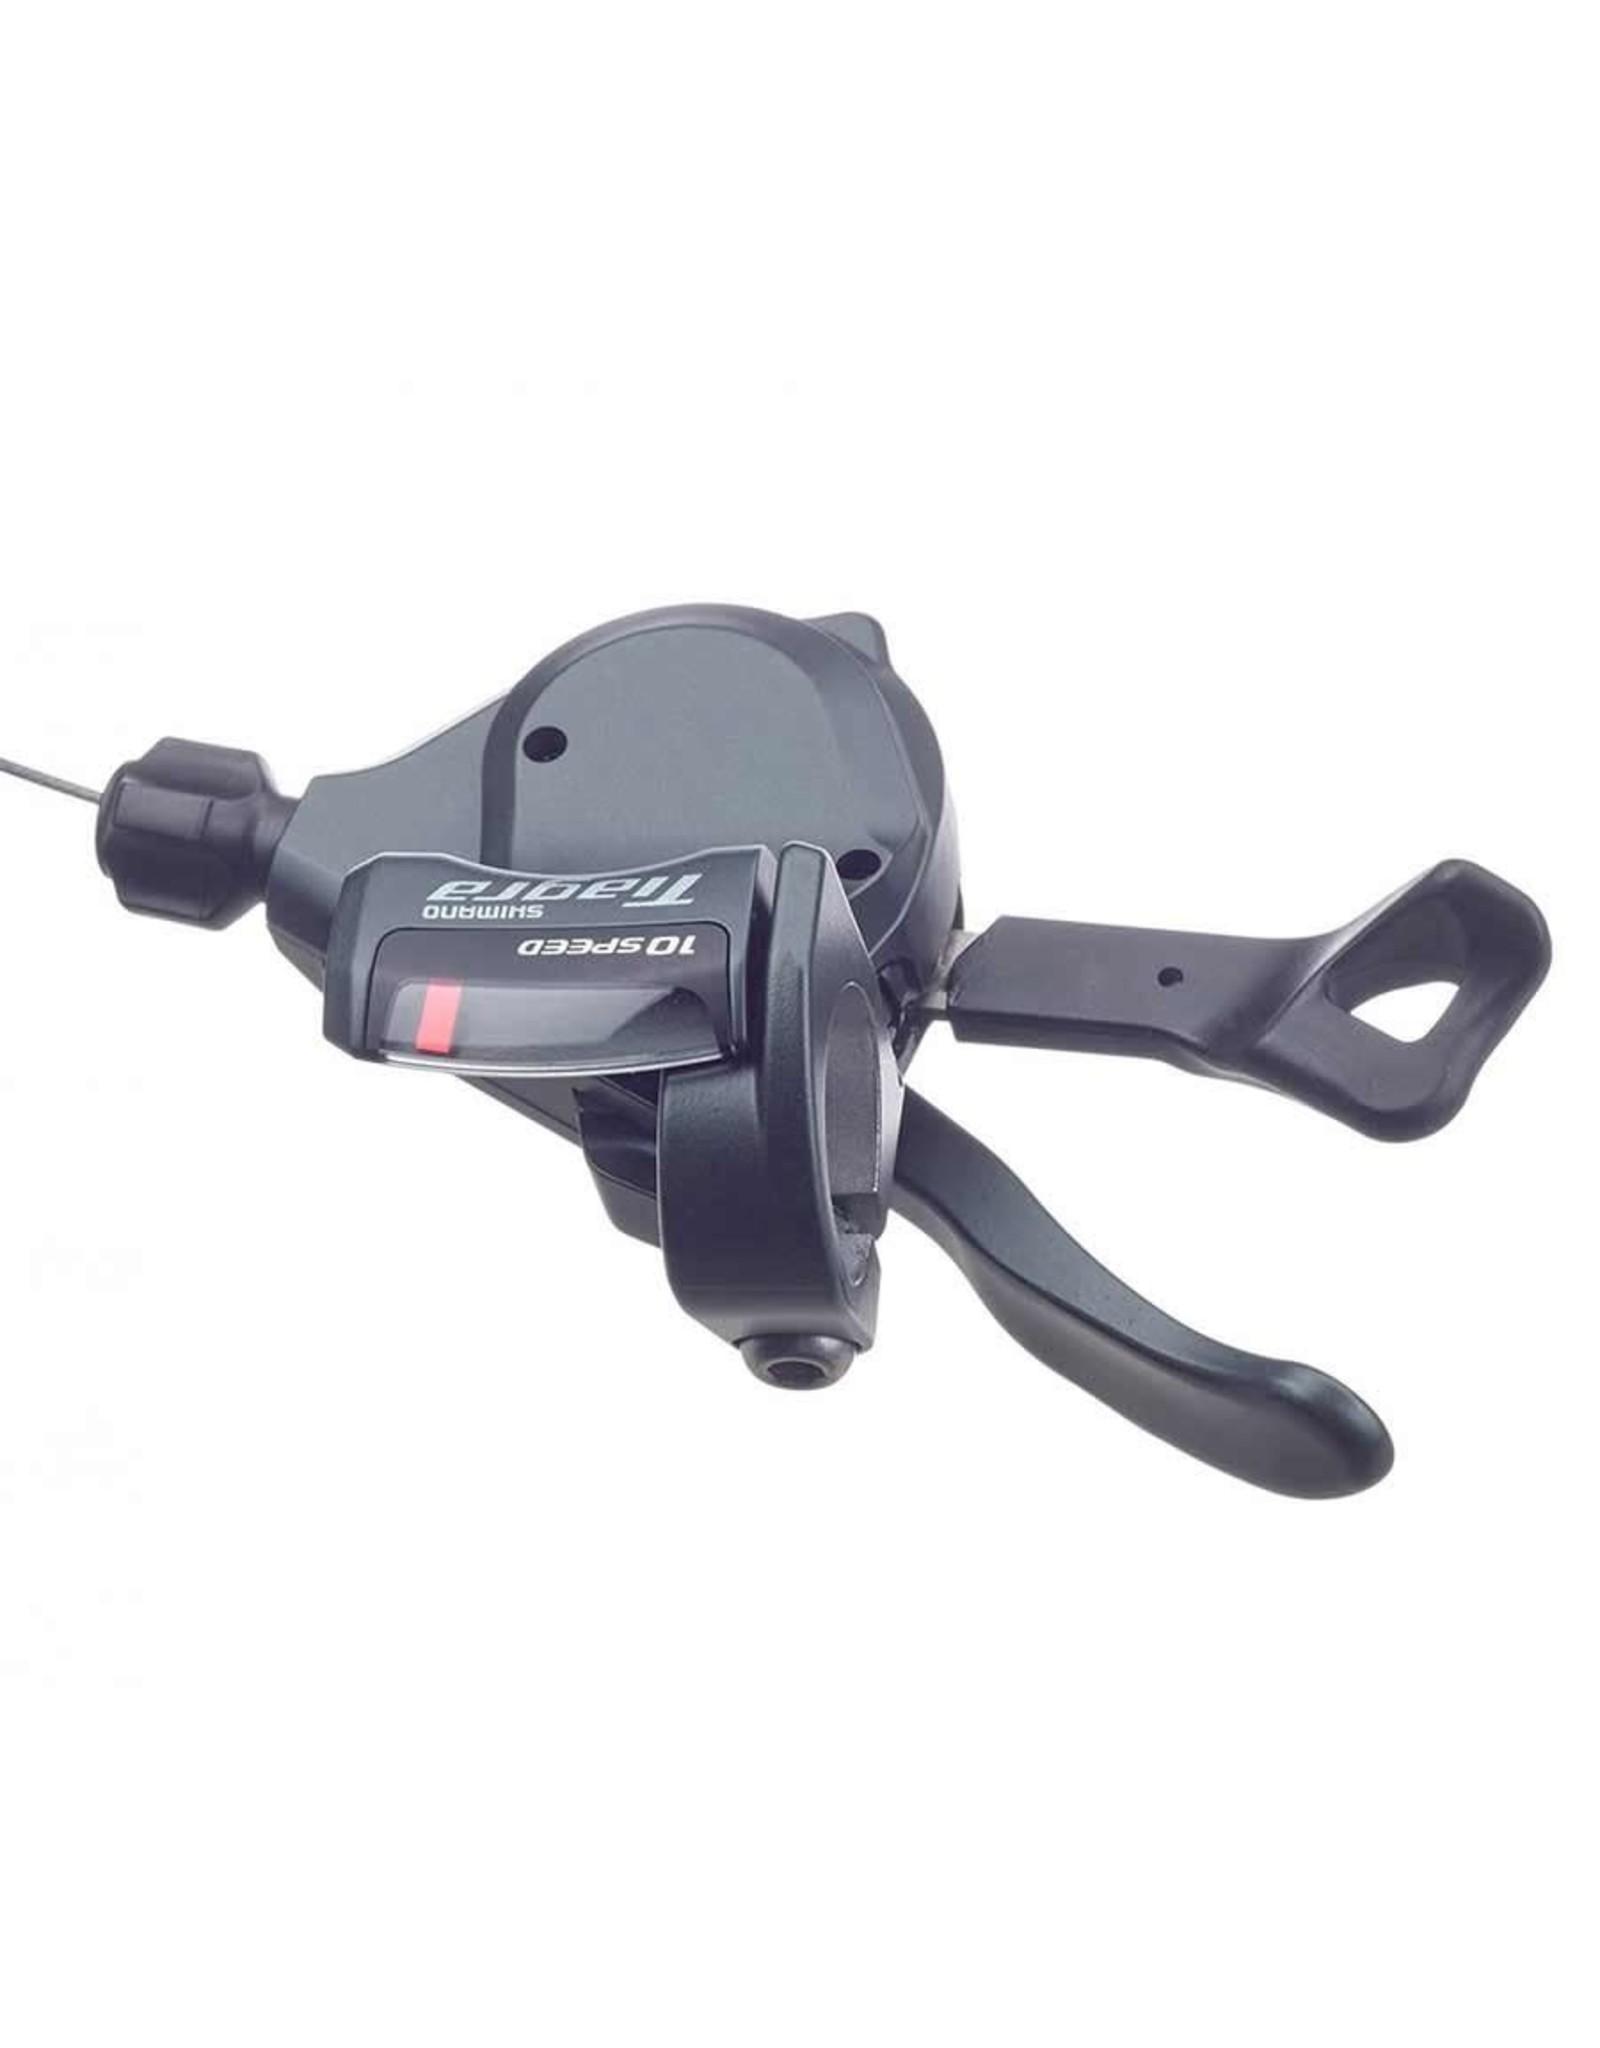 Shimano Shifter, Front, 3x - Shimano Tiagra SL-4703, Indexed, Trigger, Black